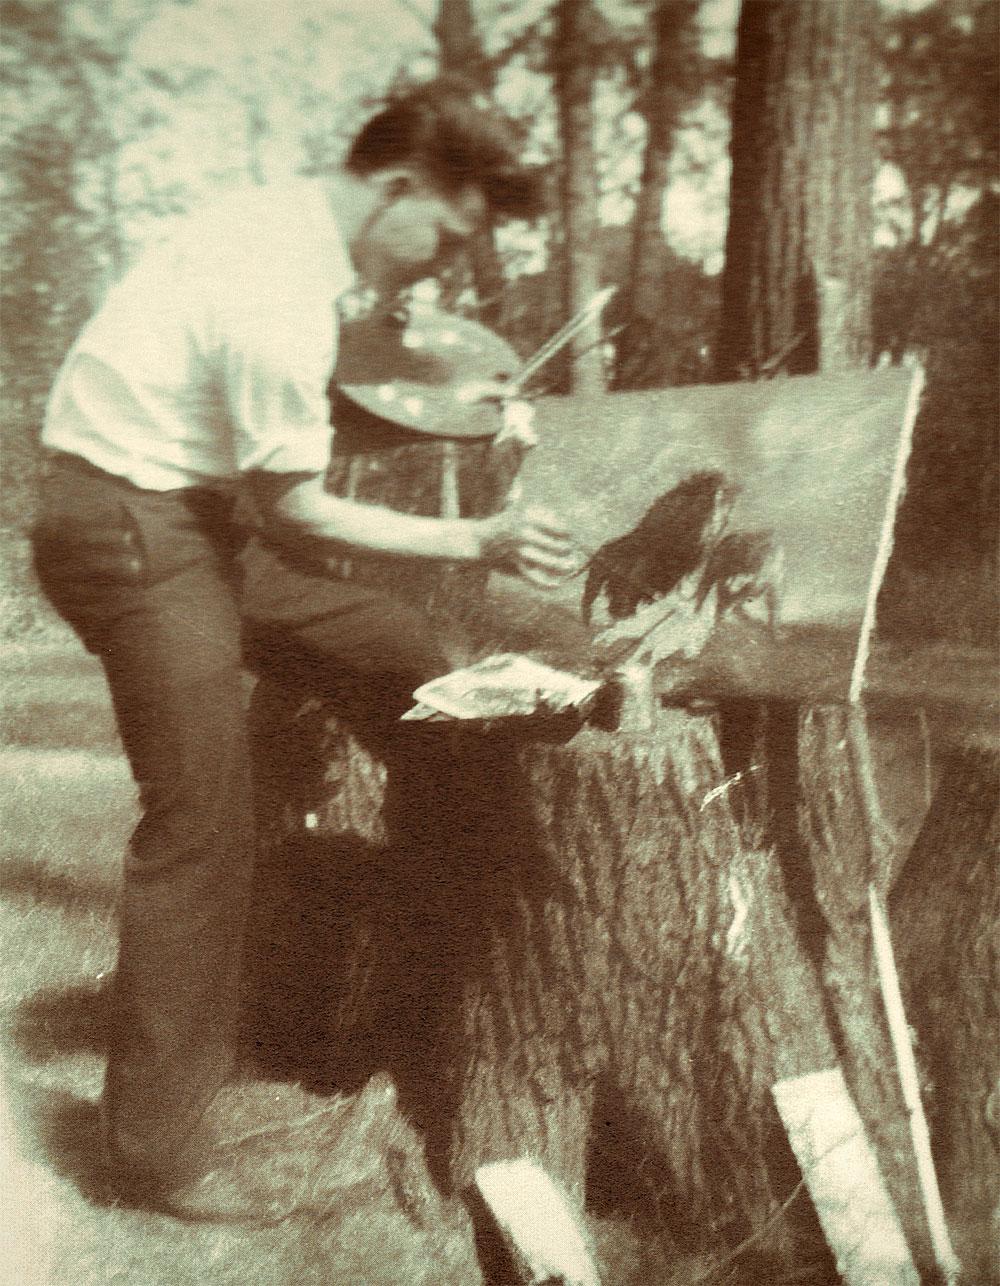 Les Kouba painting at age 16